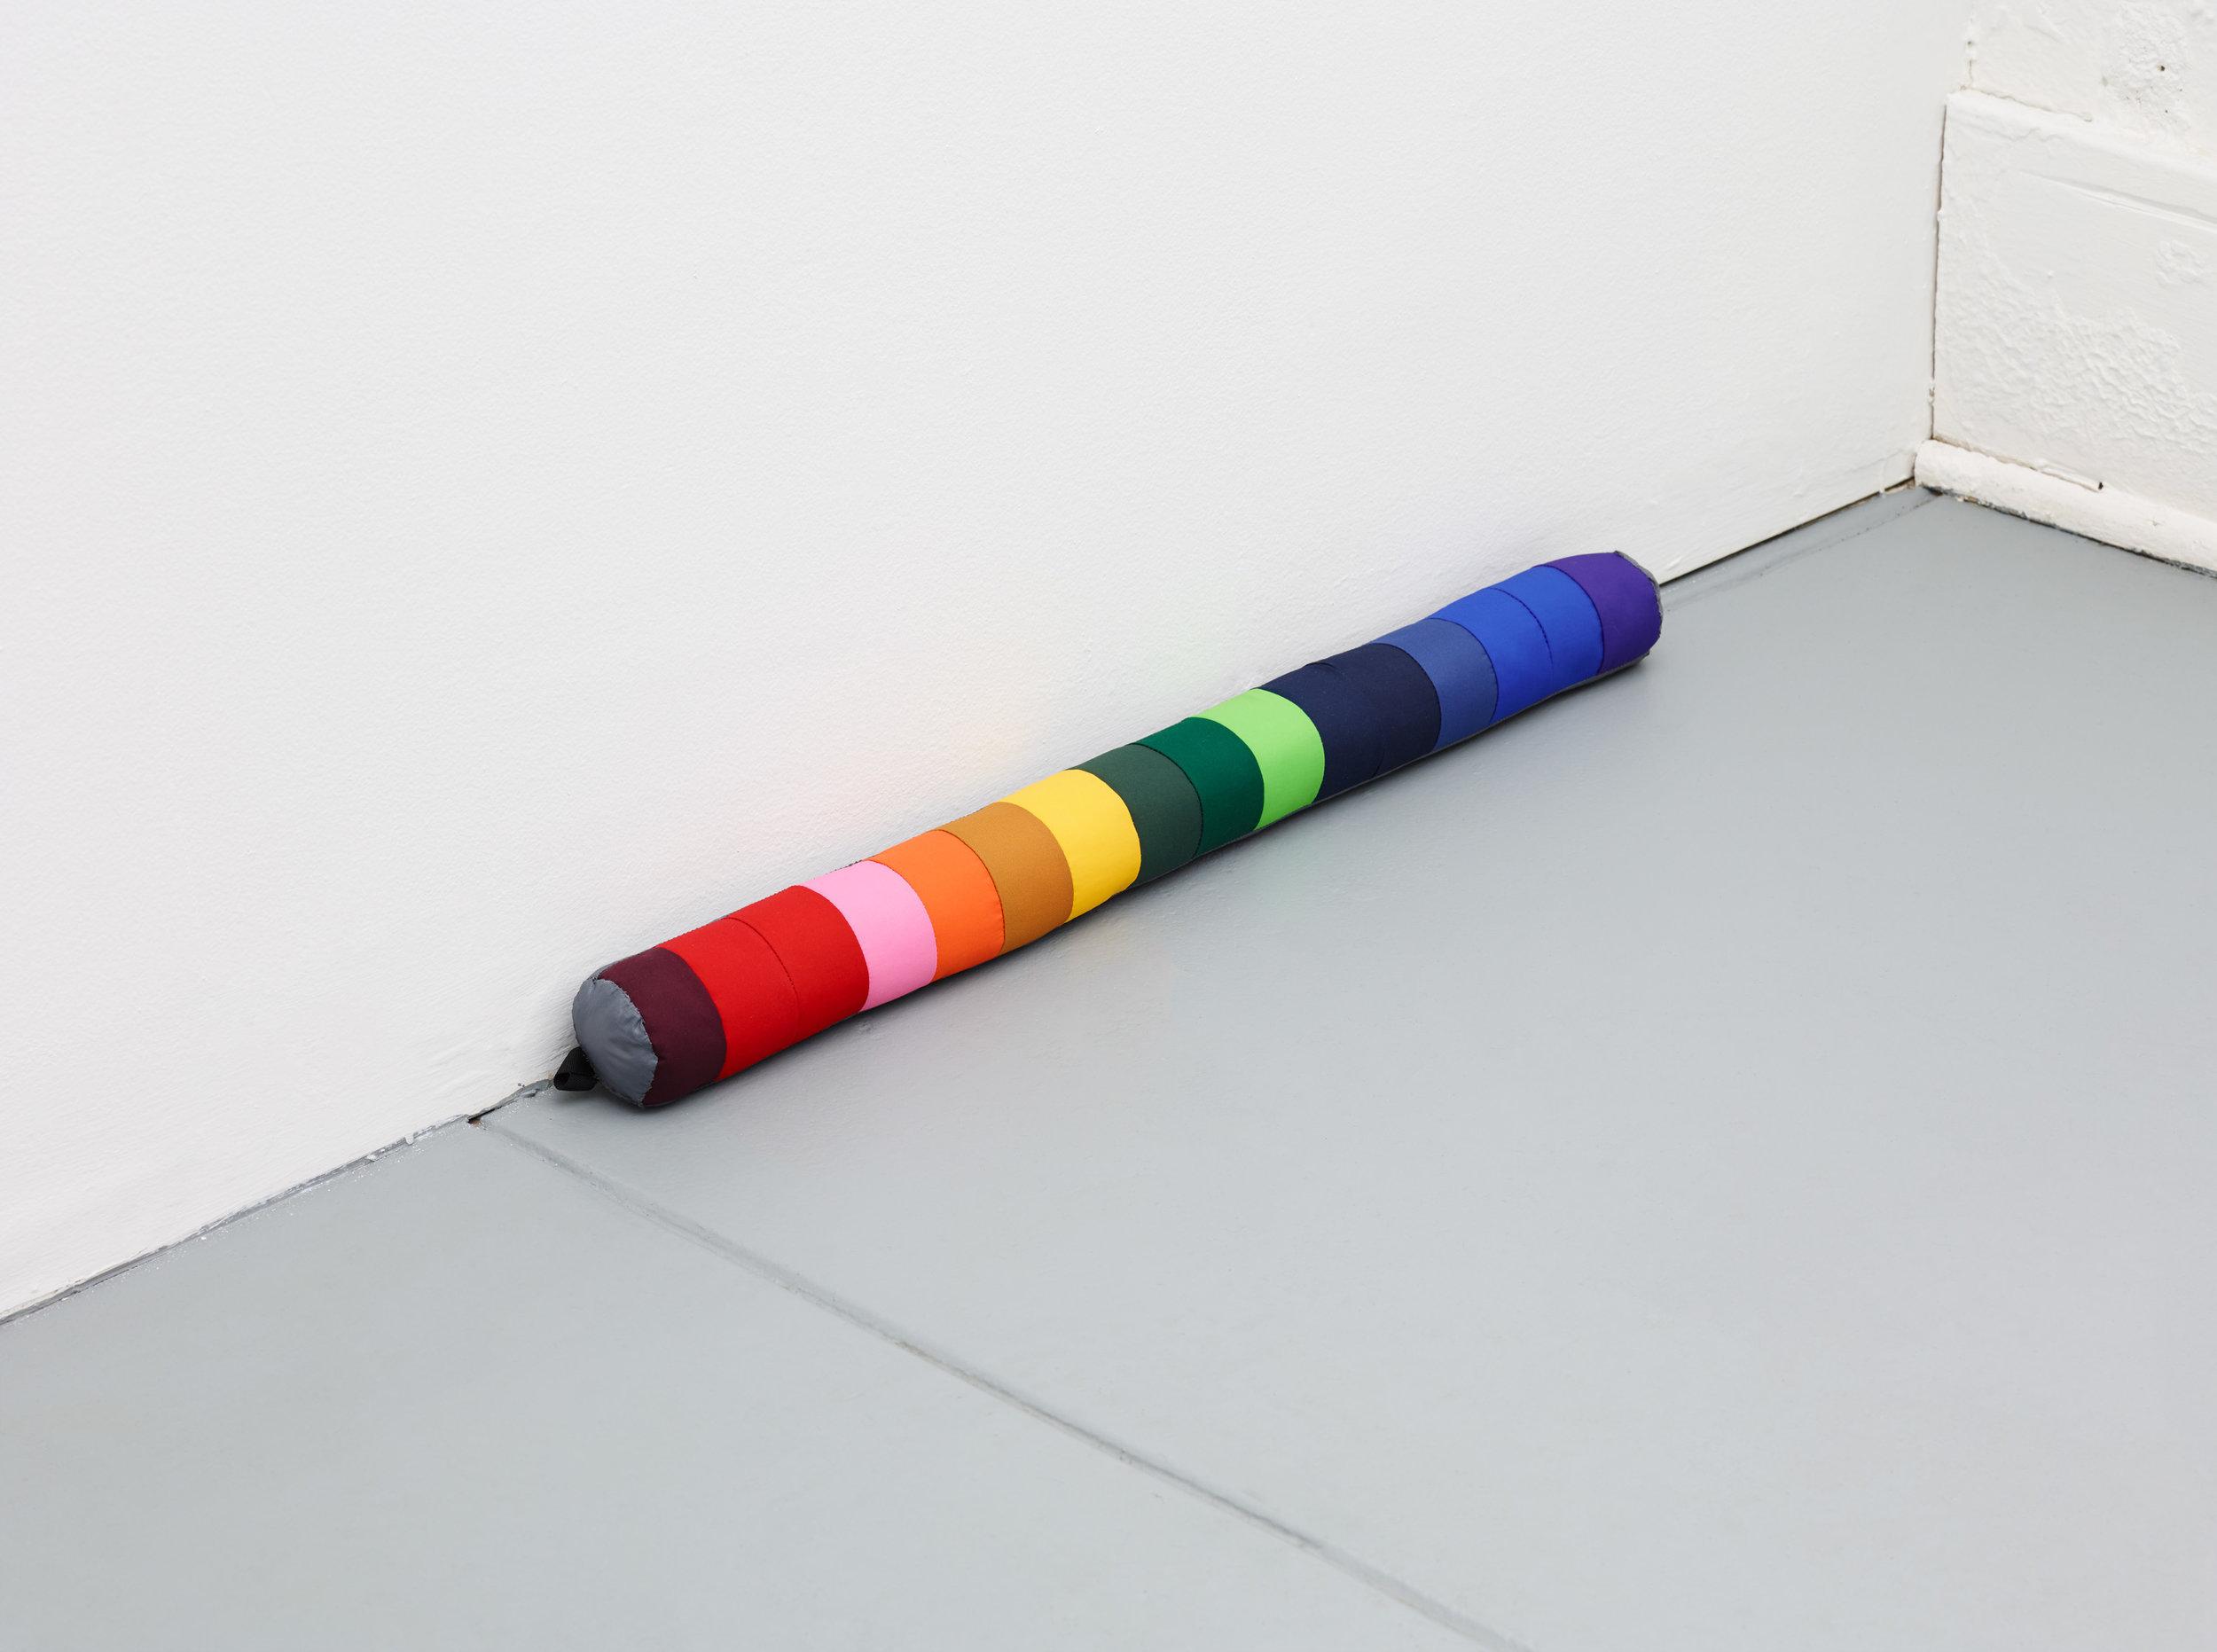 Untitled (Rainbow) , 2018. Ultrex, Momentum 50MR, Primaloft Sport, grosgrain, thread. 2 x 23 inches.